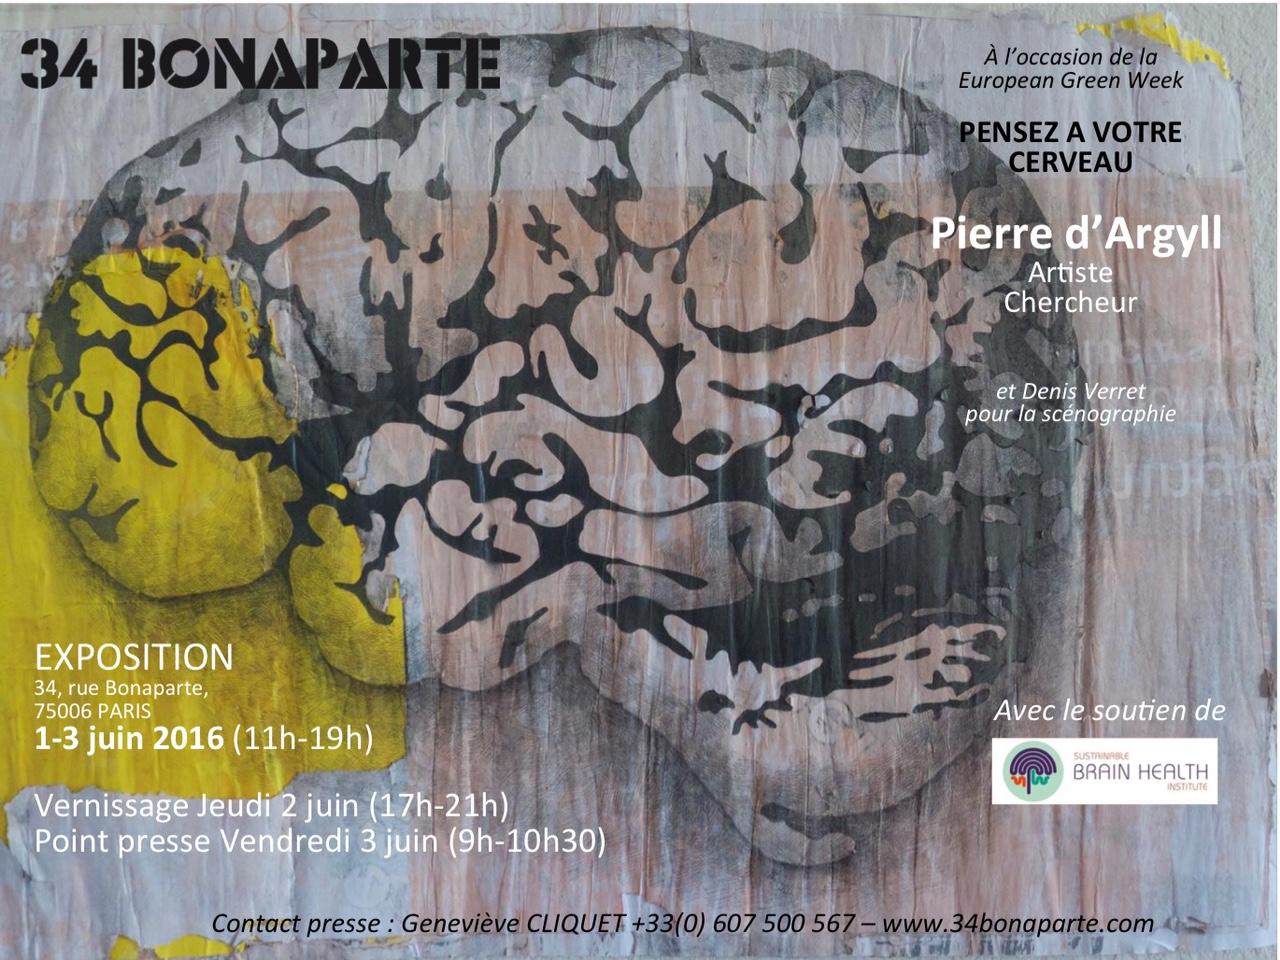 InvitationPierreDArgyll34rueBonaparte